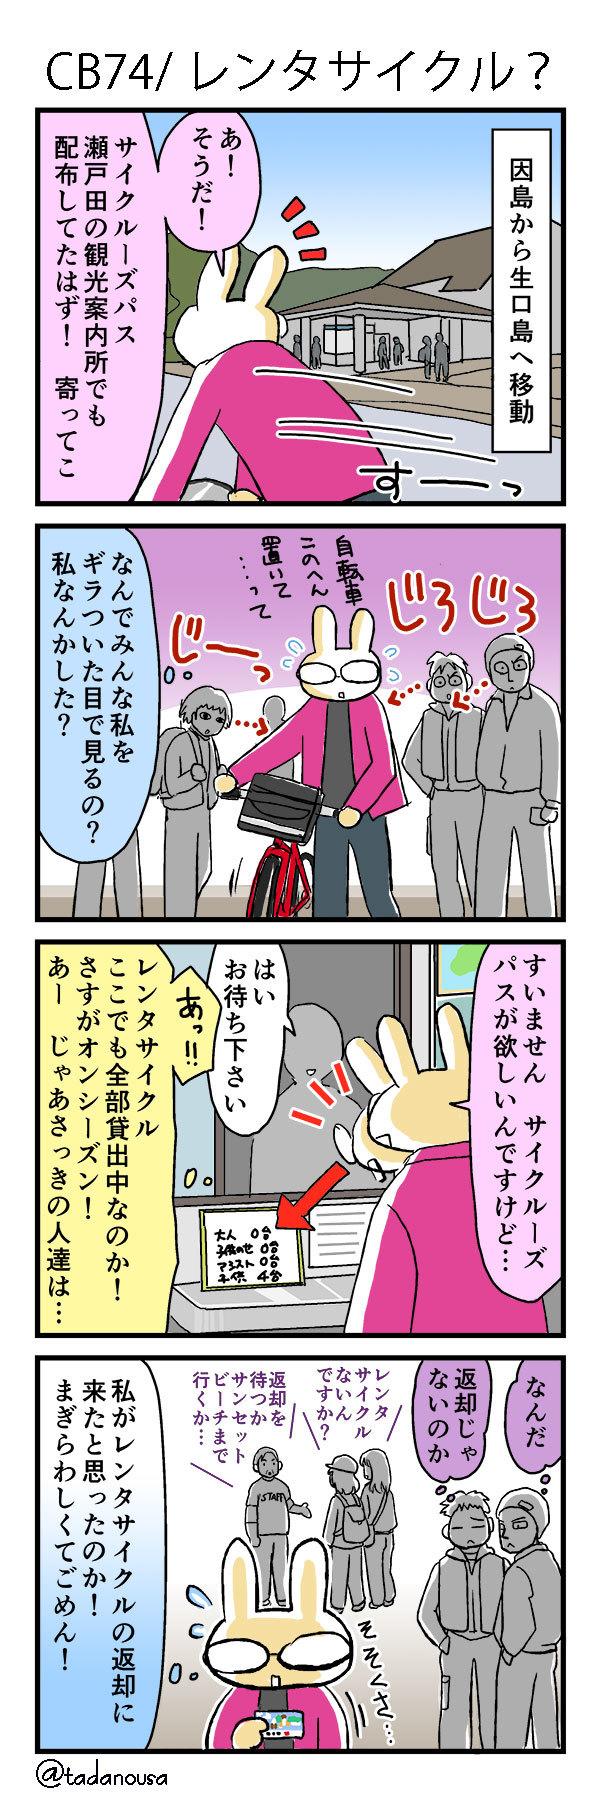 bike_4koma_kako114_s.jpg